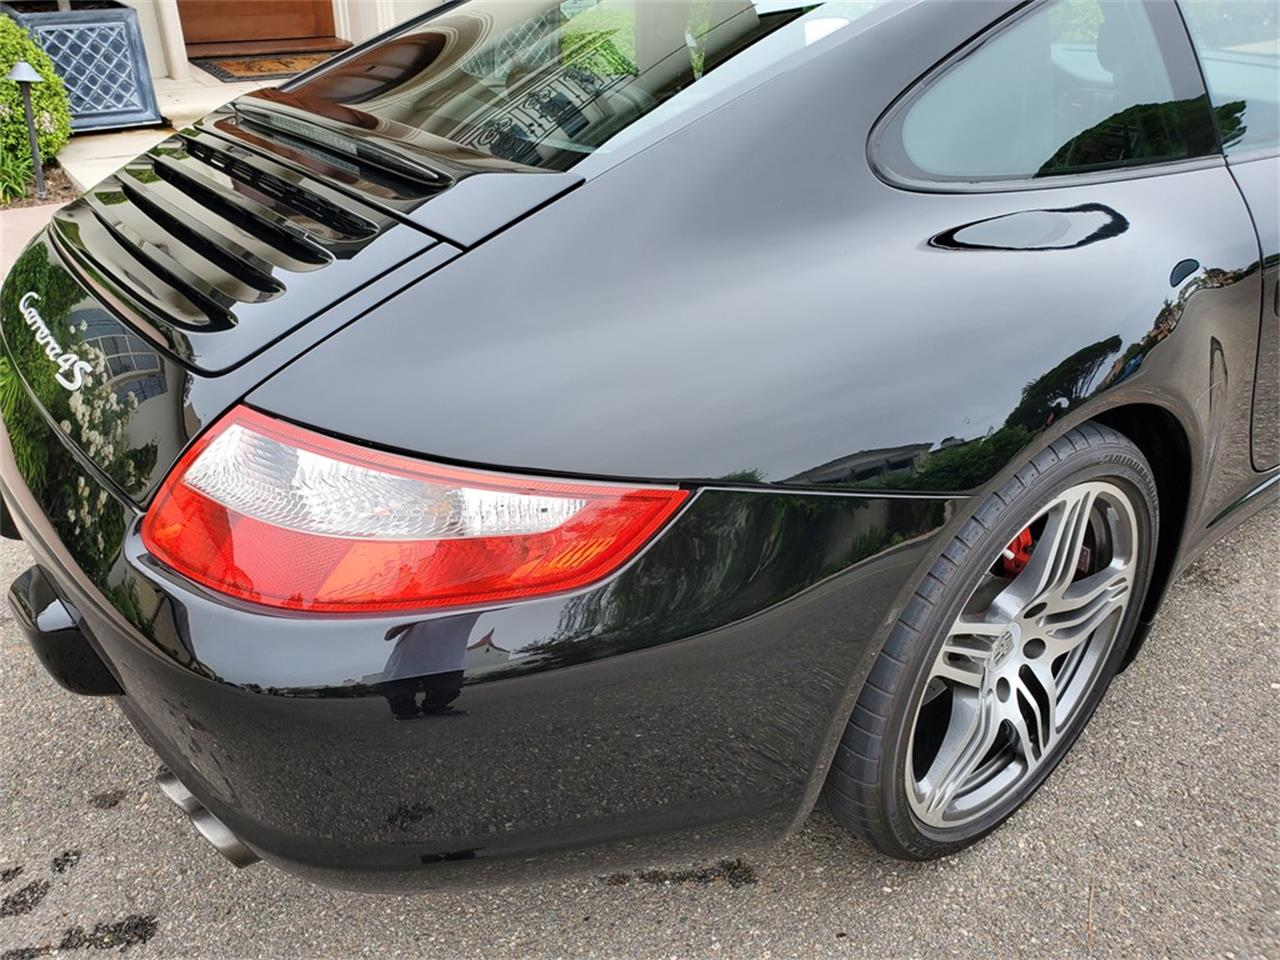 Large Picture of 2007 Porsche 911 Carrera 4S located in California - QT04